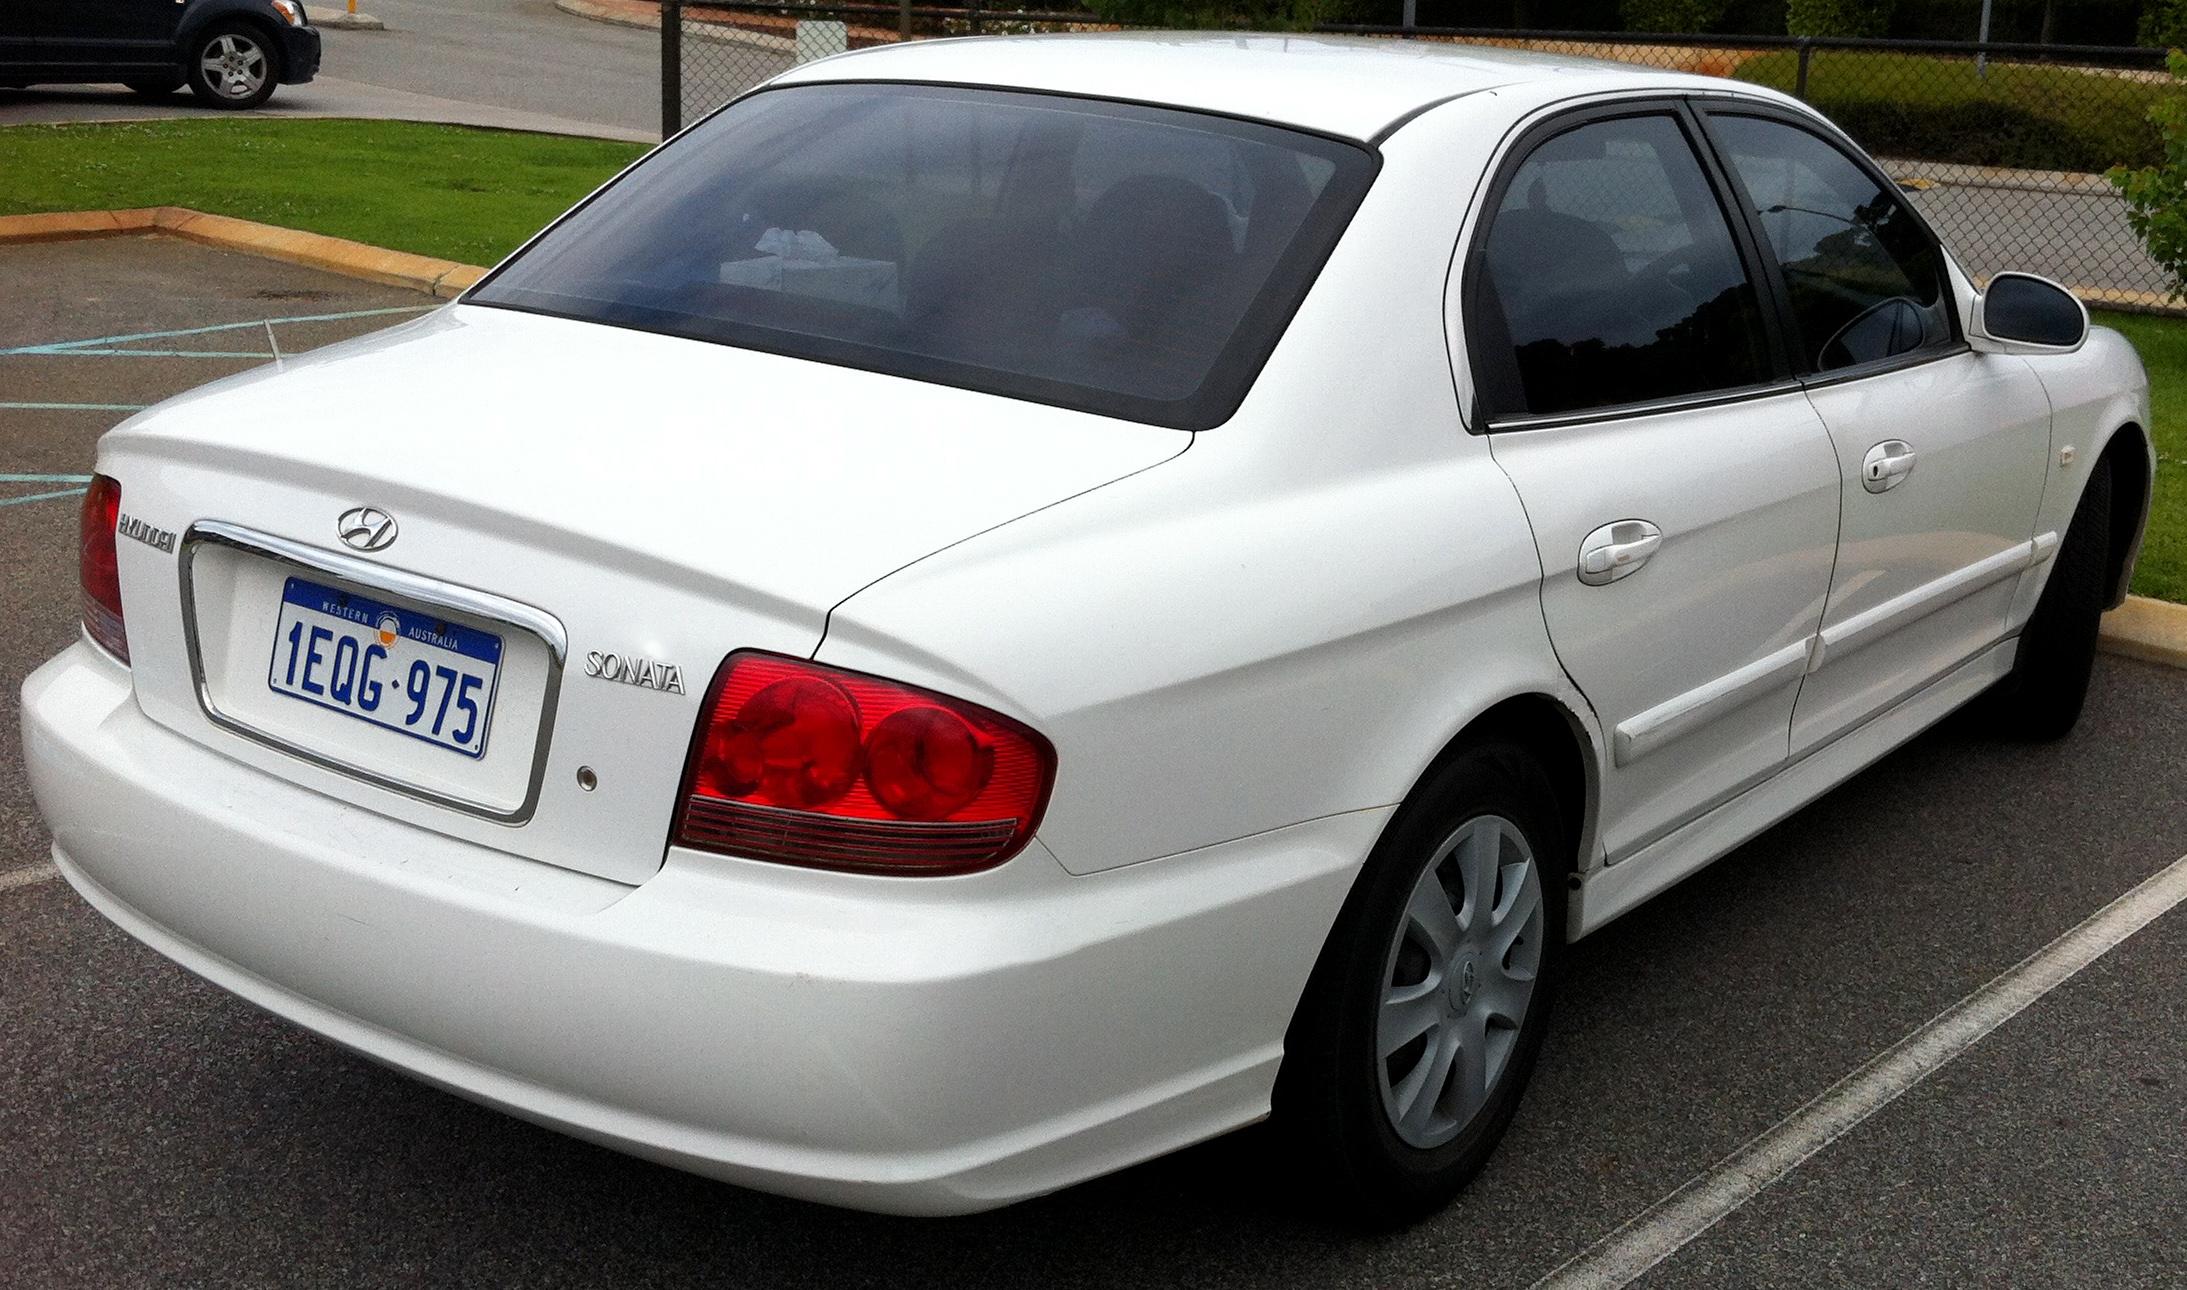 Hyundai Sonata I Y 2 1 8 97 Hp